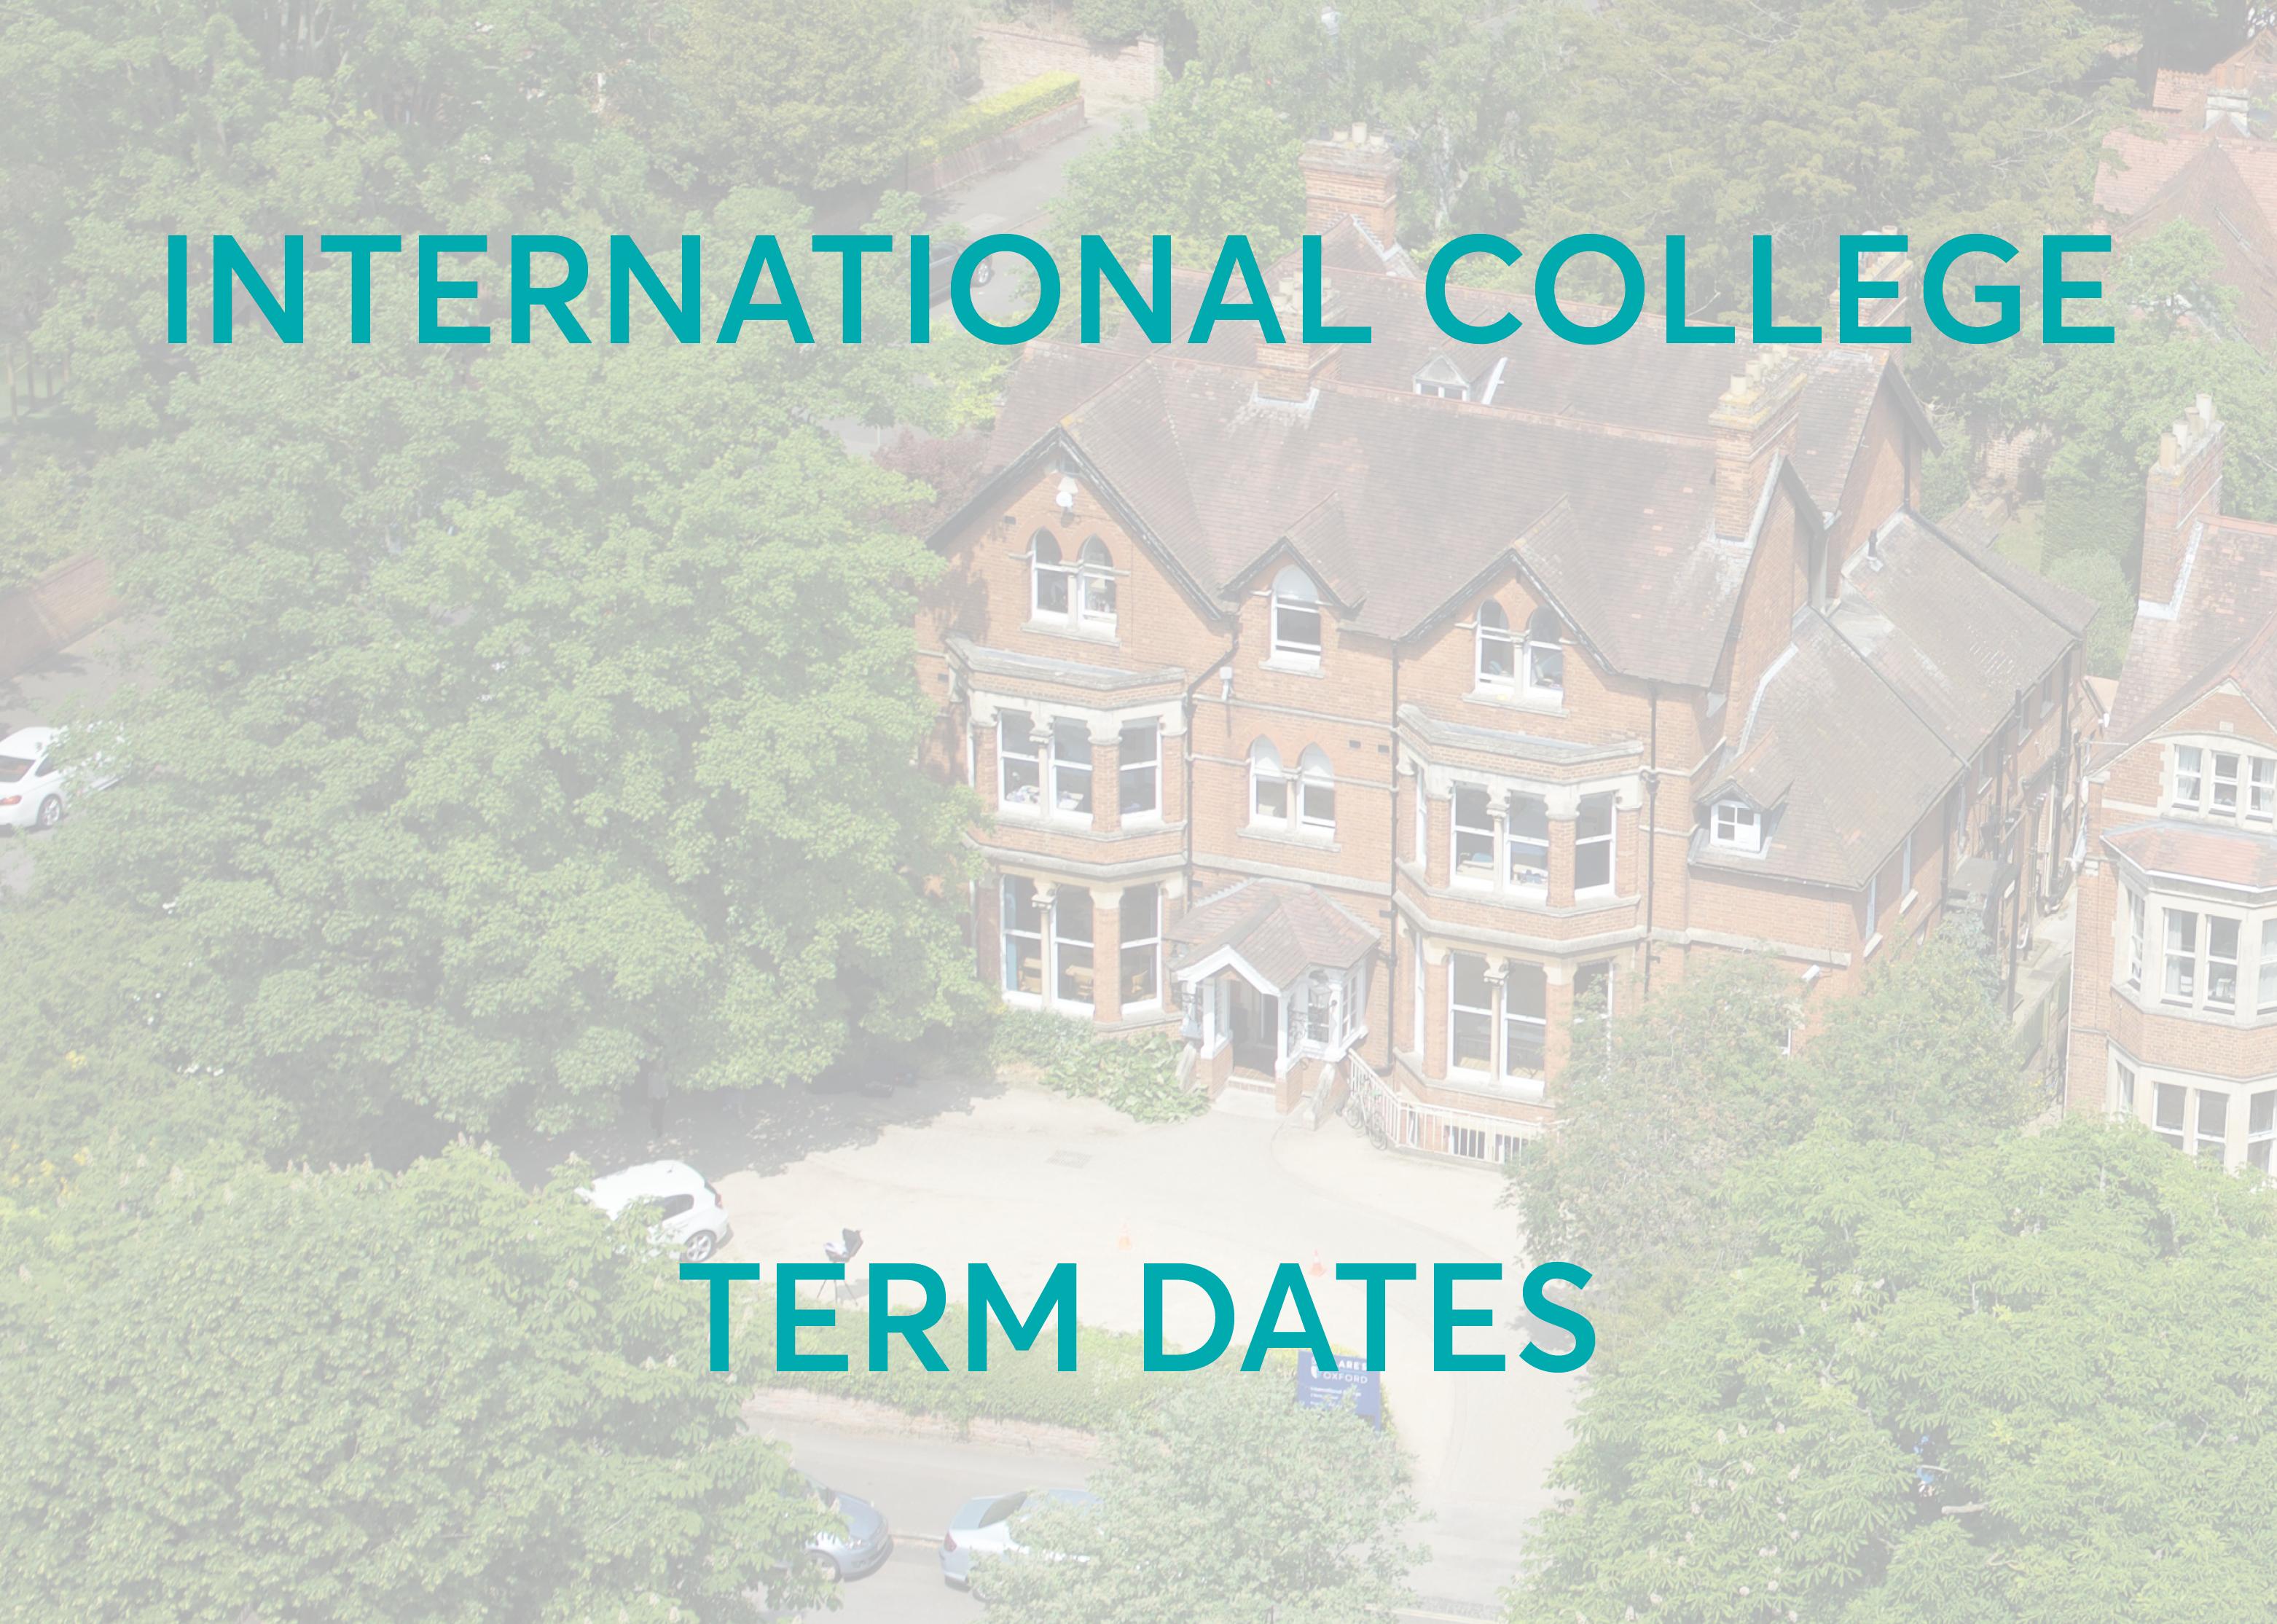 University Foundation Programme Term Dates